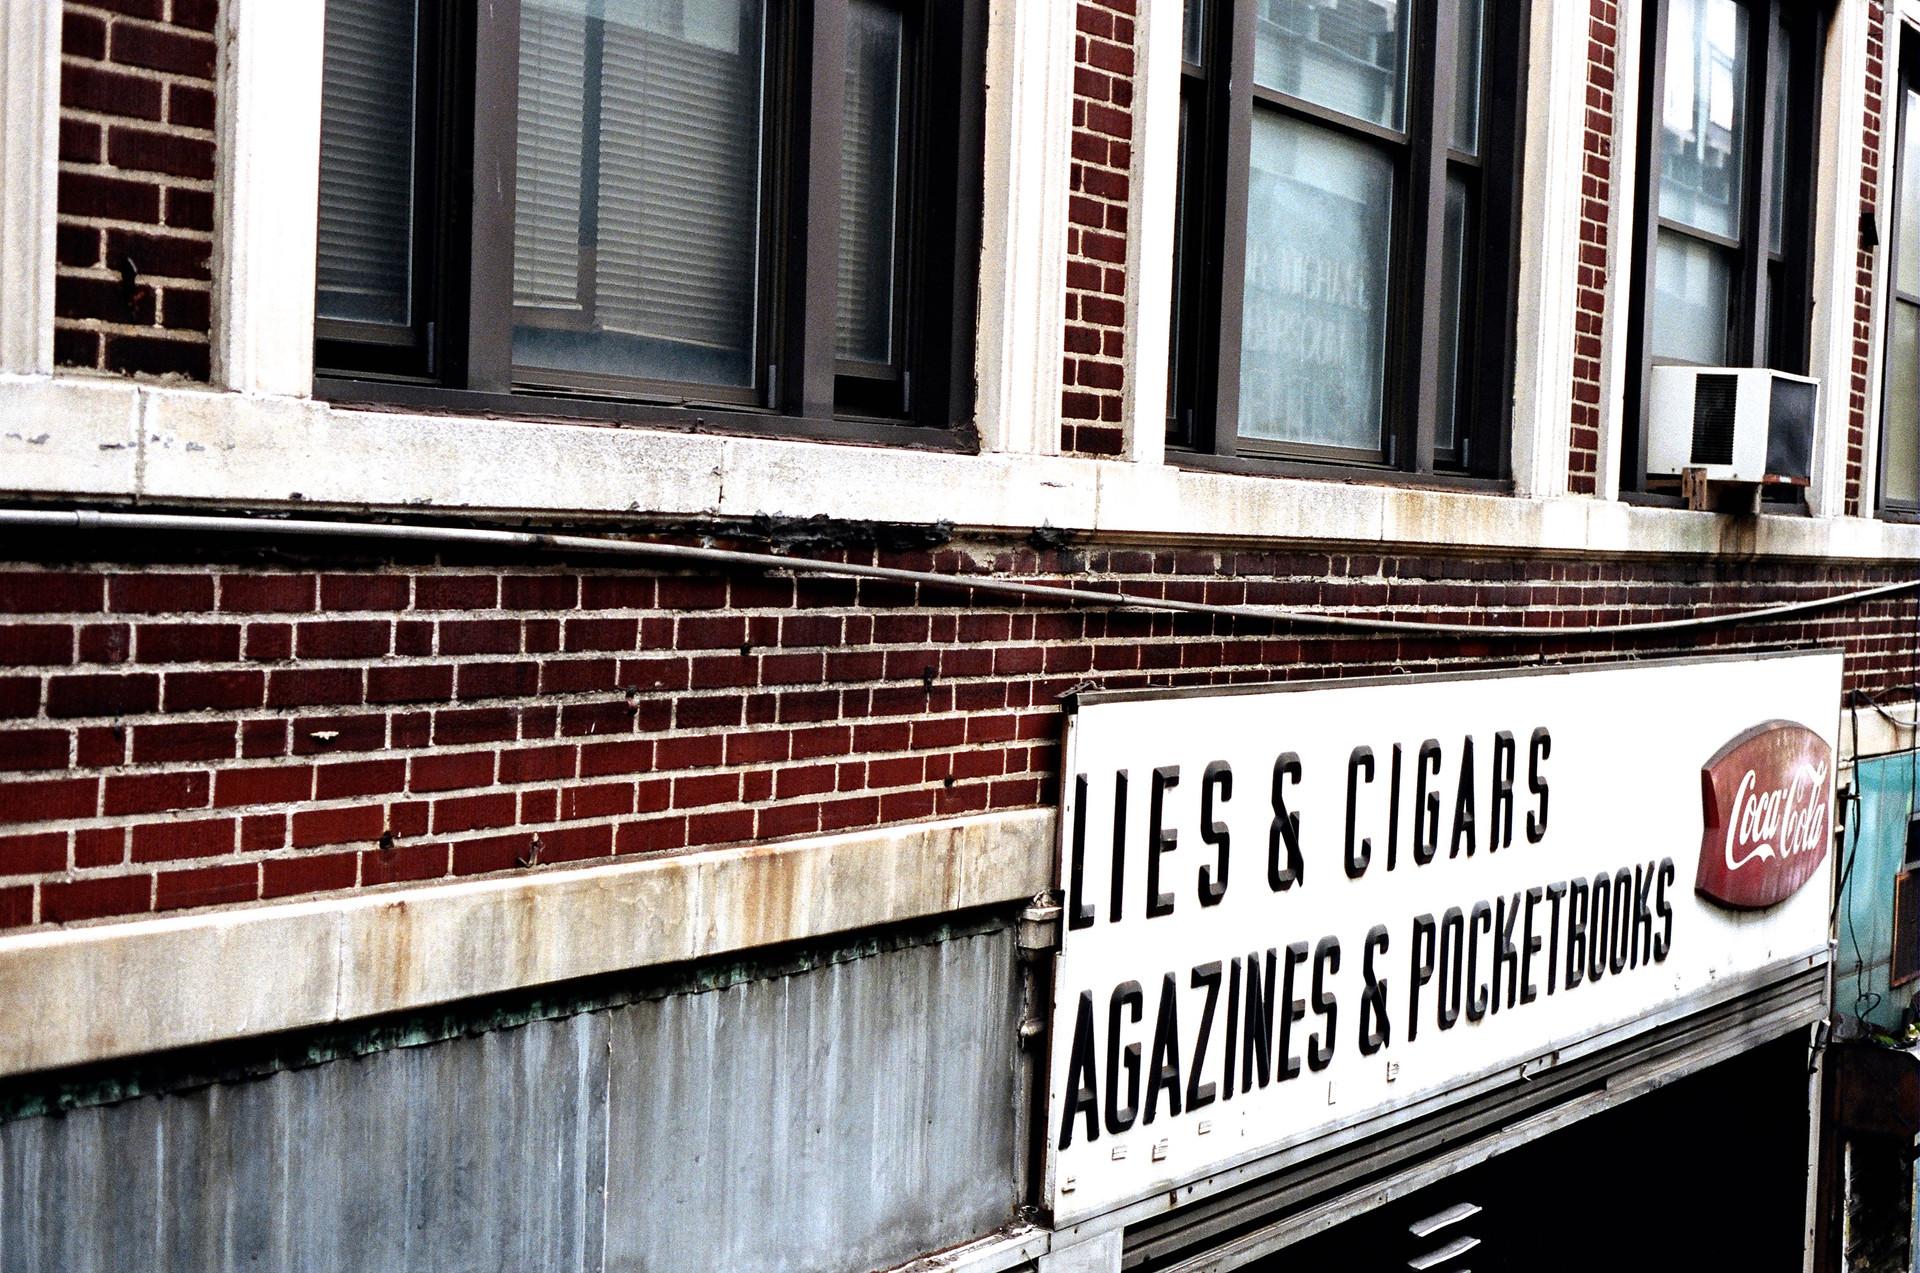 Lies & Cigars